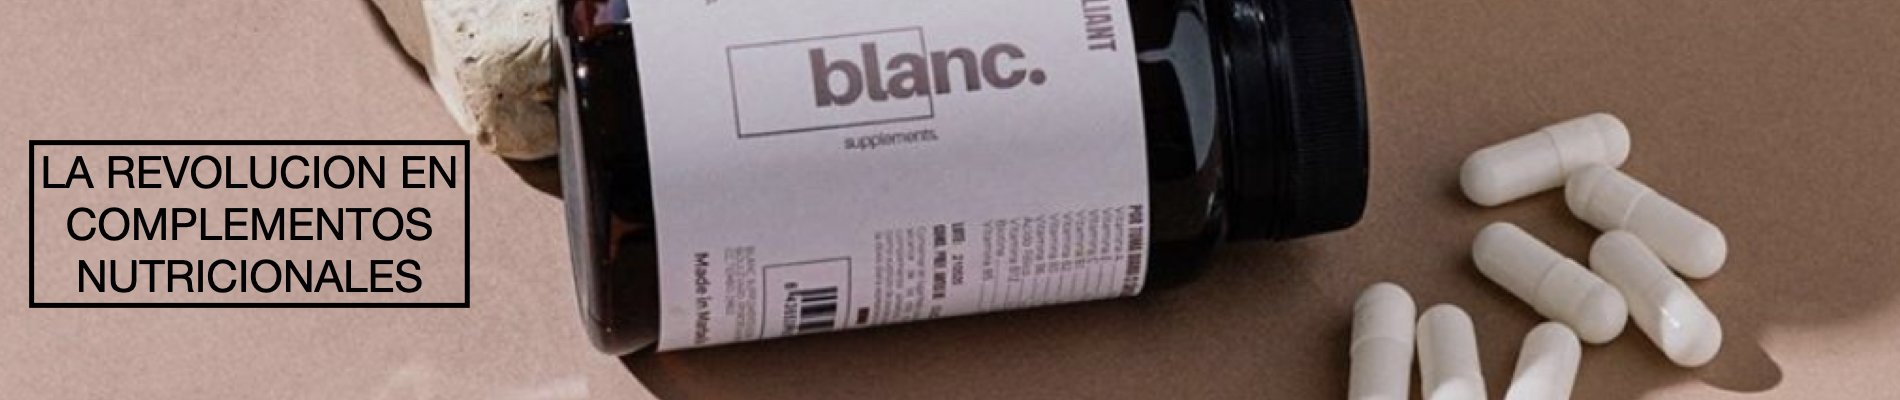 BLANC_001.jpg